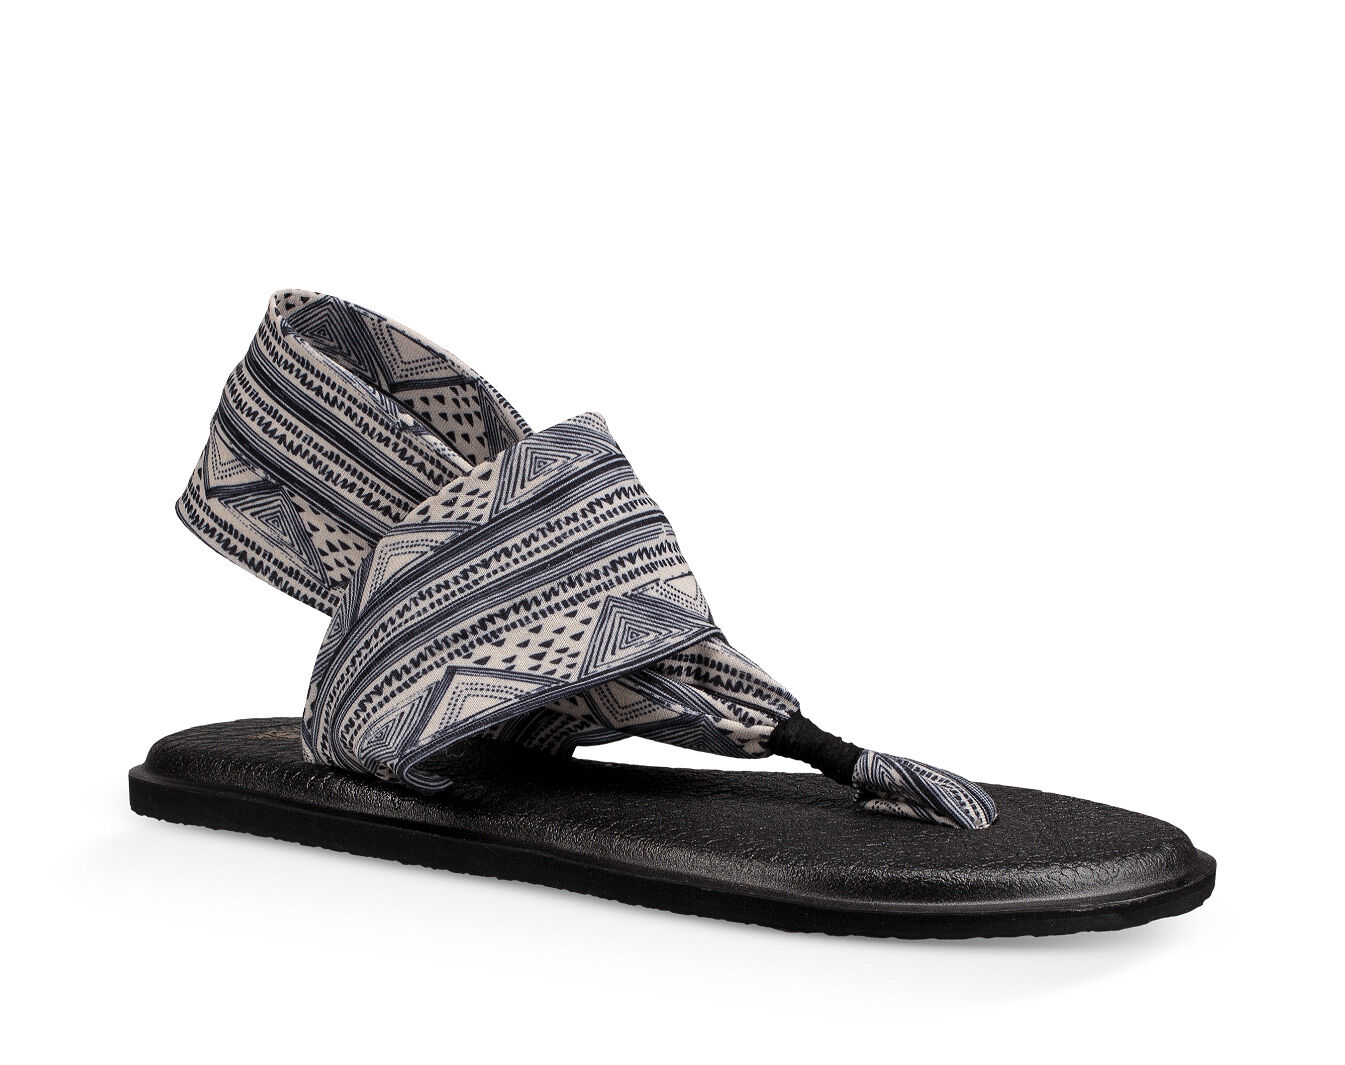 Yoga Sling 2 Prints Stretch Knit Sandals SaeZpm